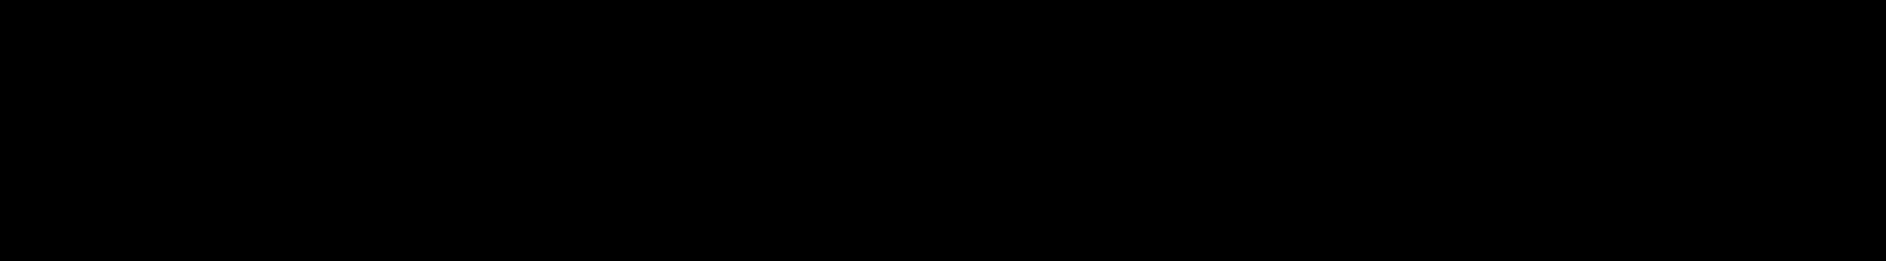 MSCOTTVOGEL